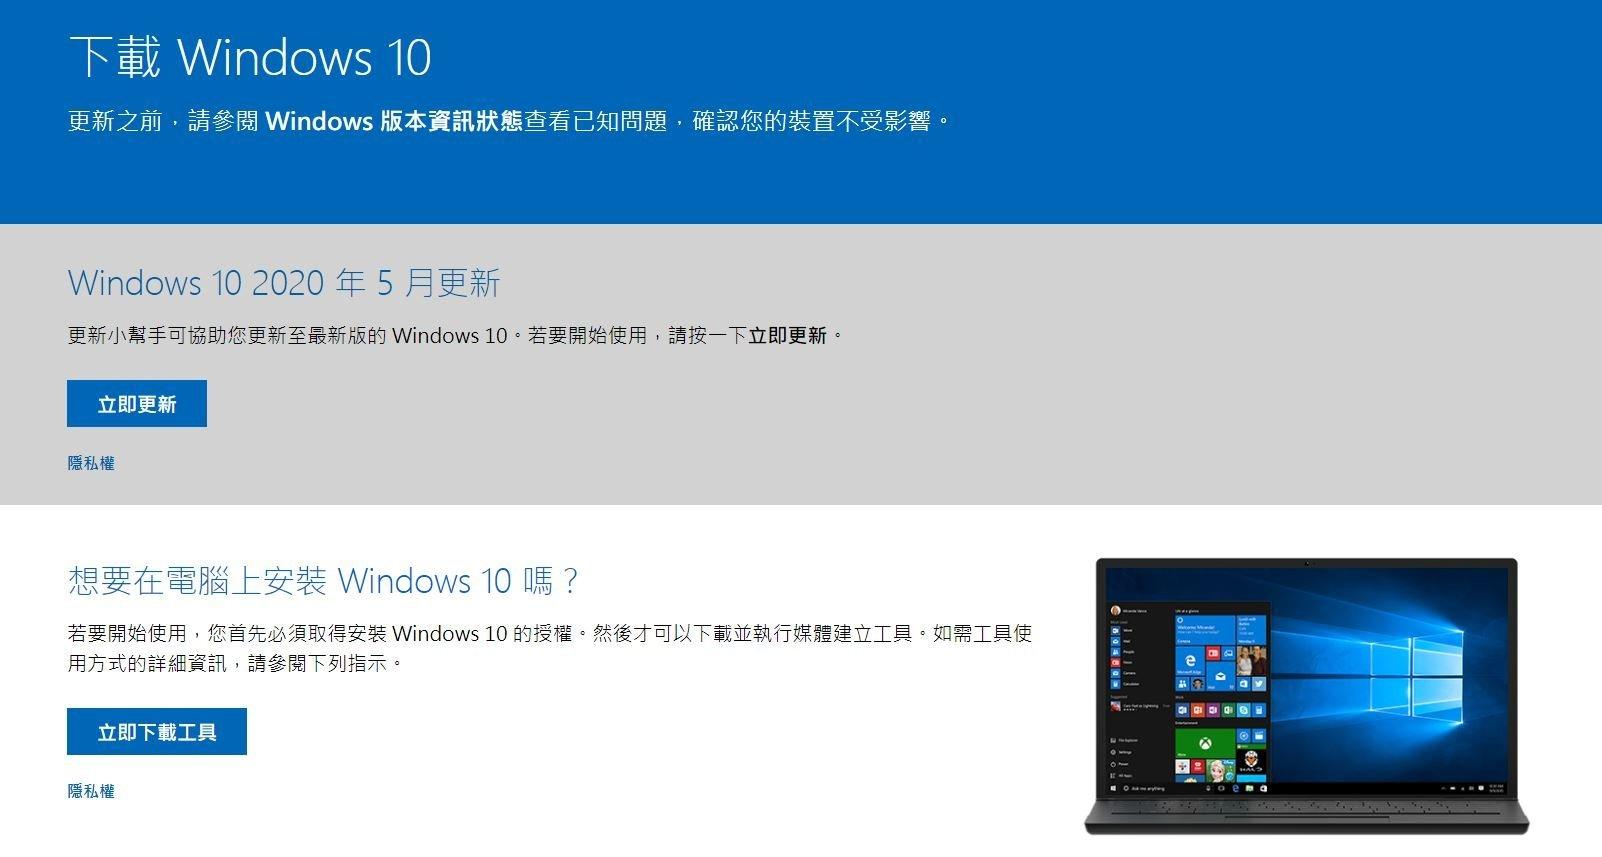 Windows 10 安裝程式USB隨身碟官方網站擷取